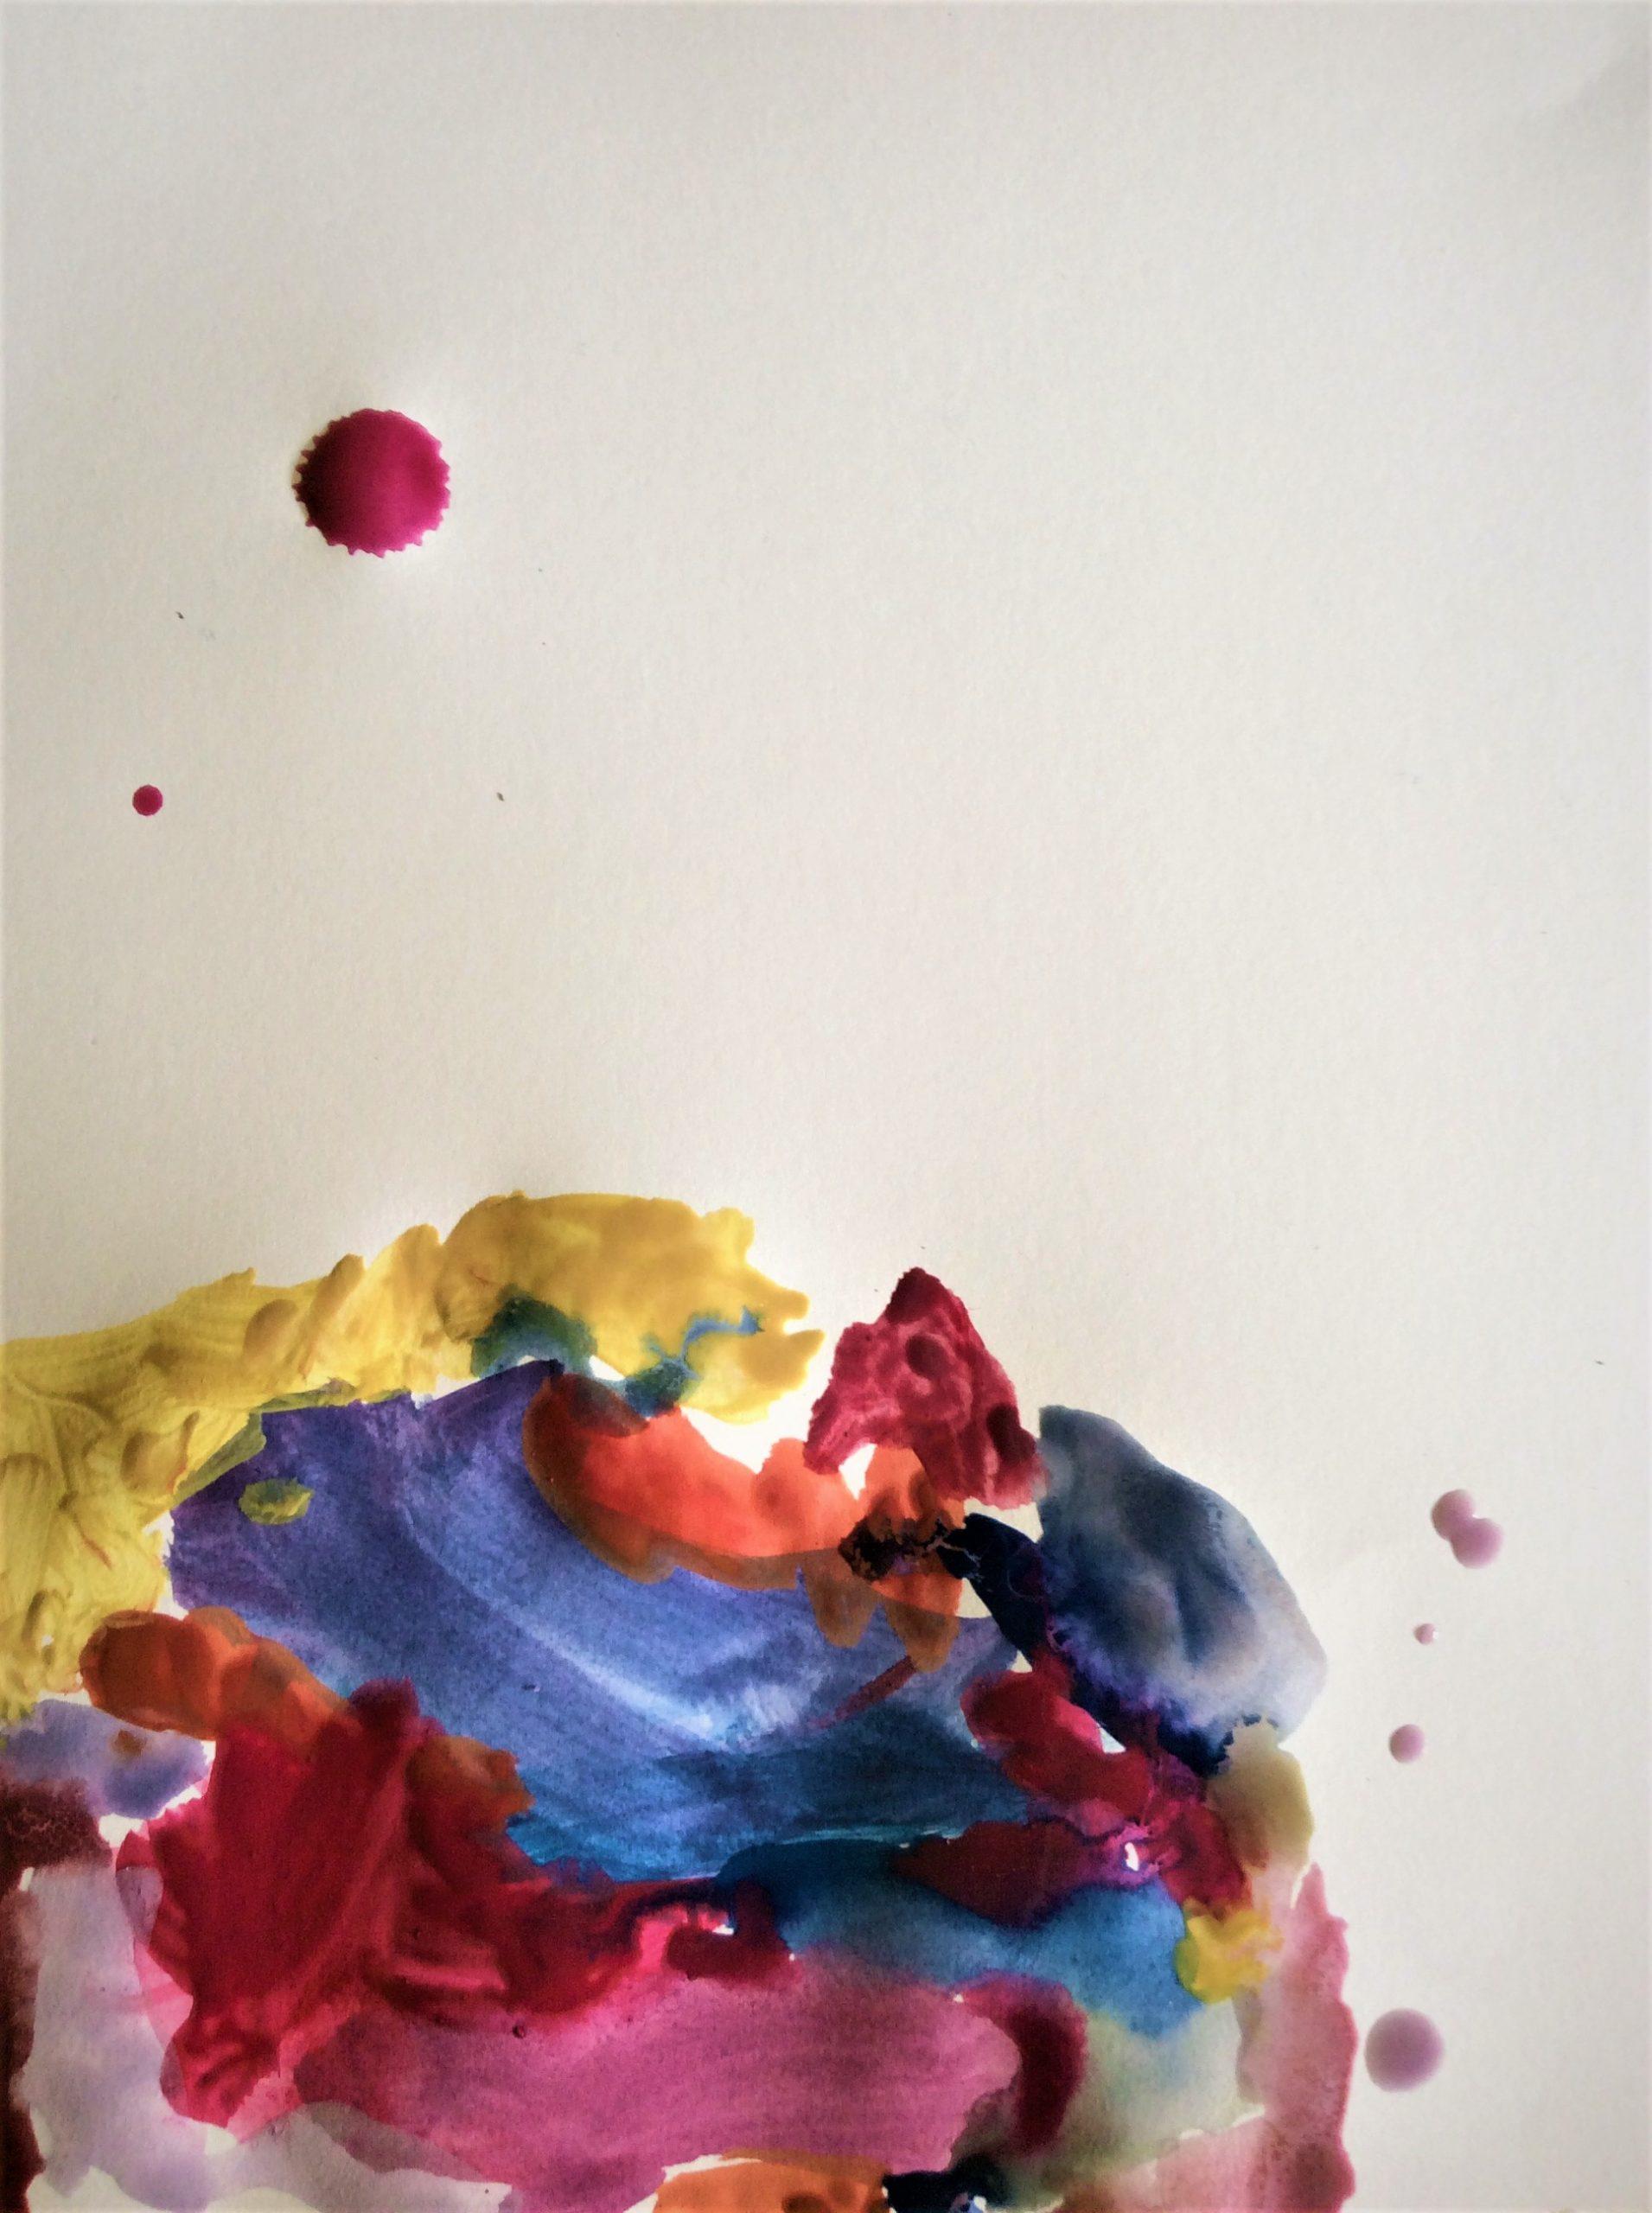 A drop of paint